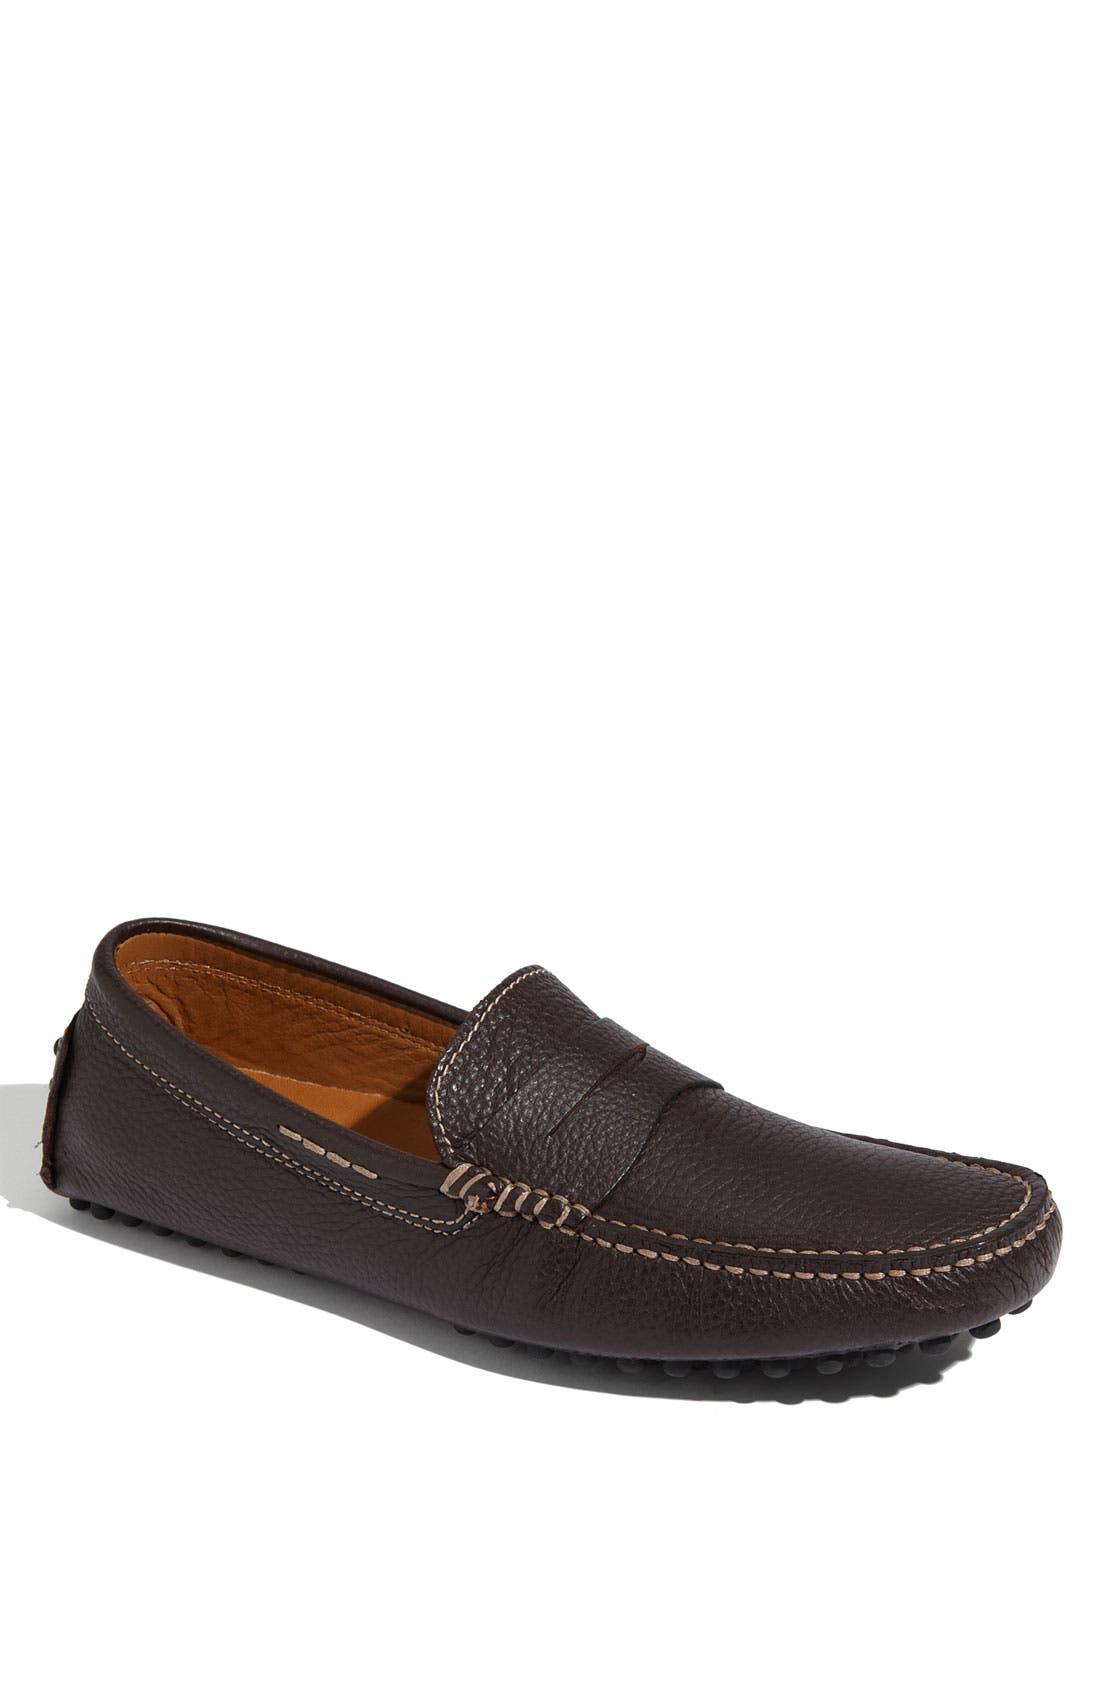 Alternate Image 1 Selected - G Brown 'Tobago' Driving Shoe